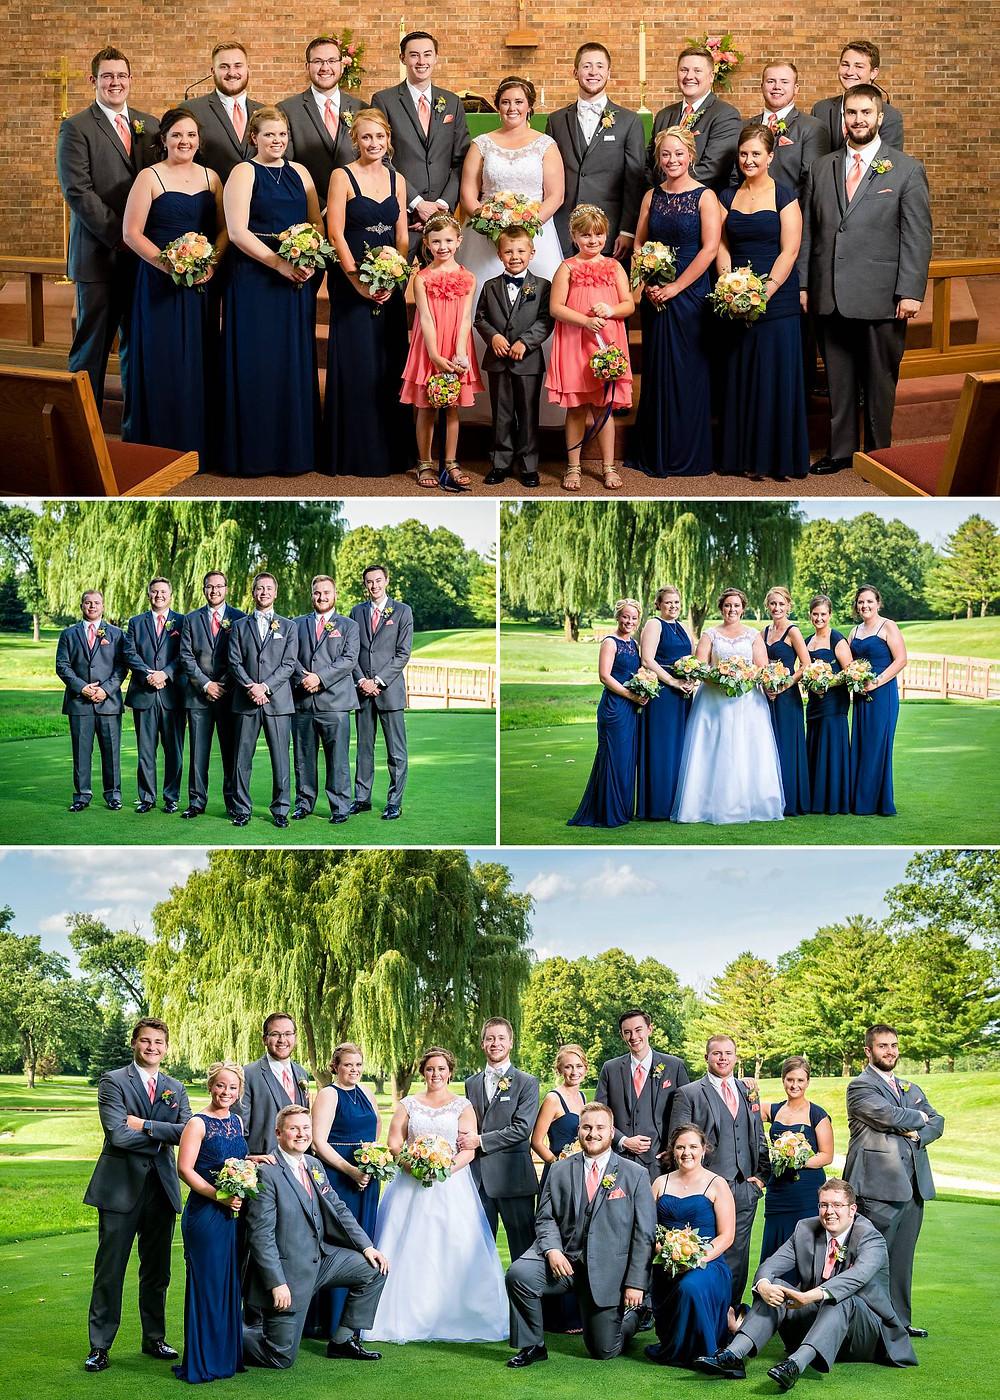 Oshkosh Wisconsin Bridal Party Photos   Lanari Photography